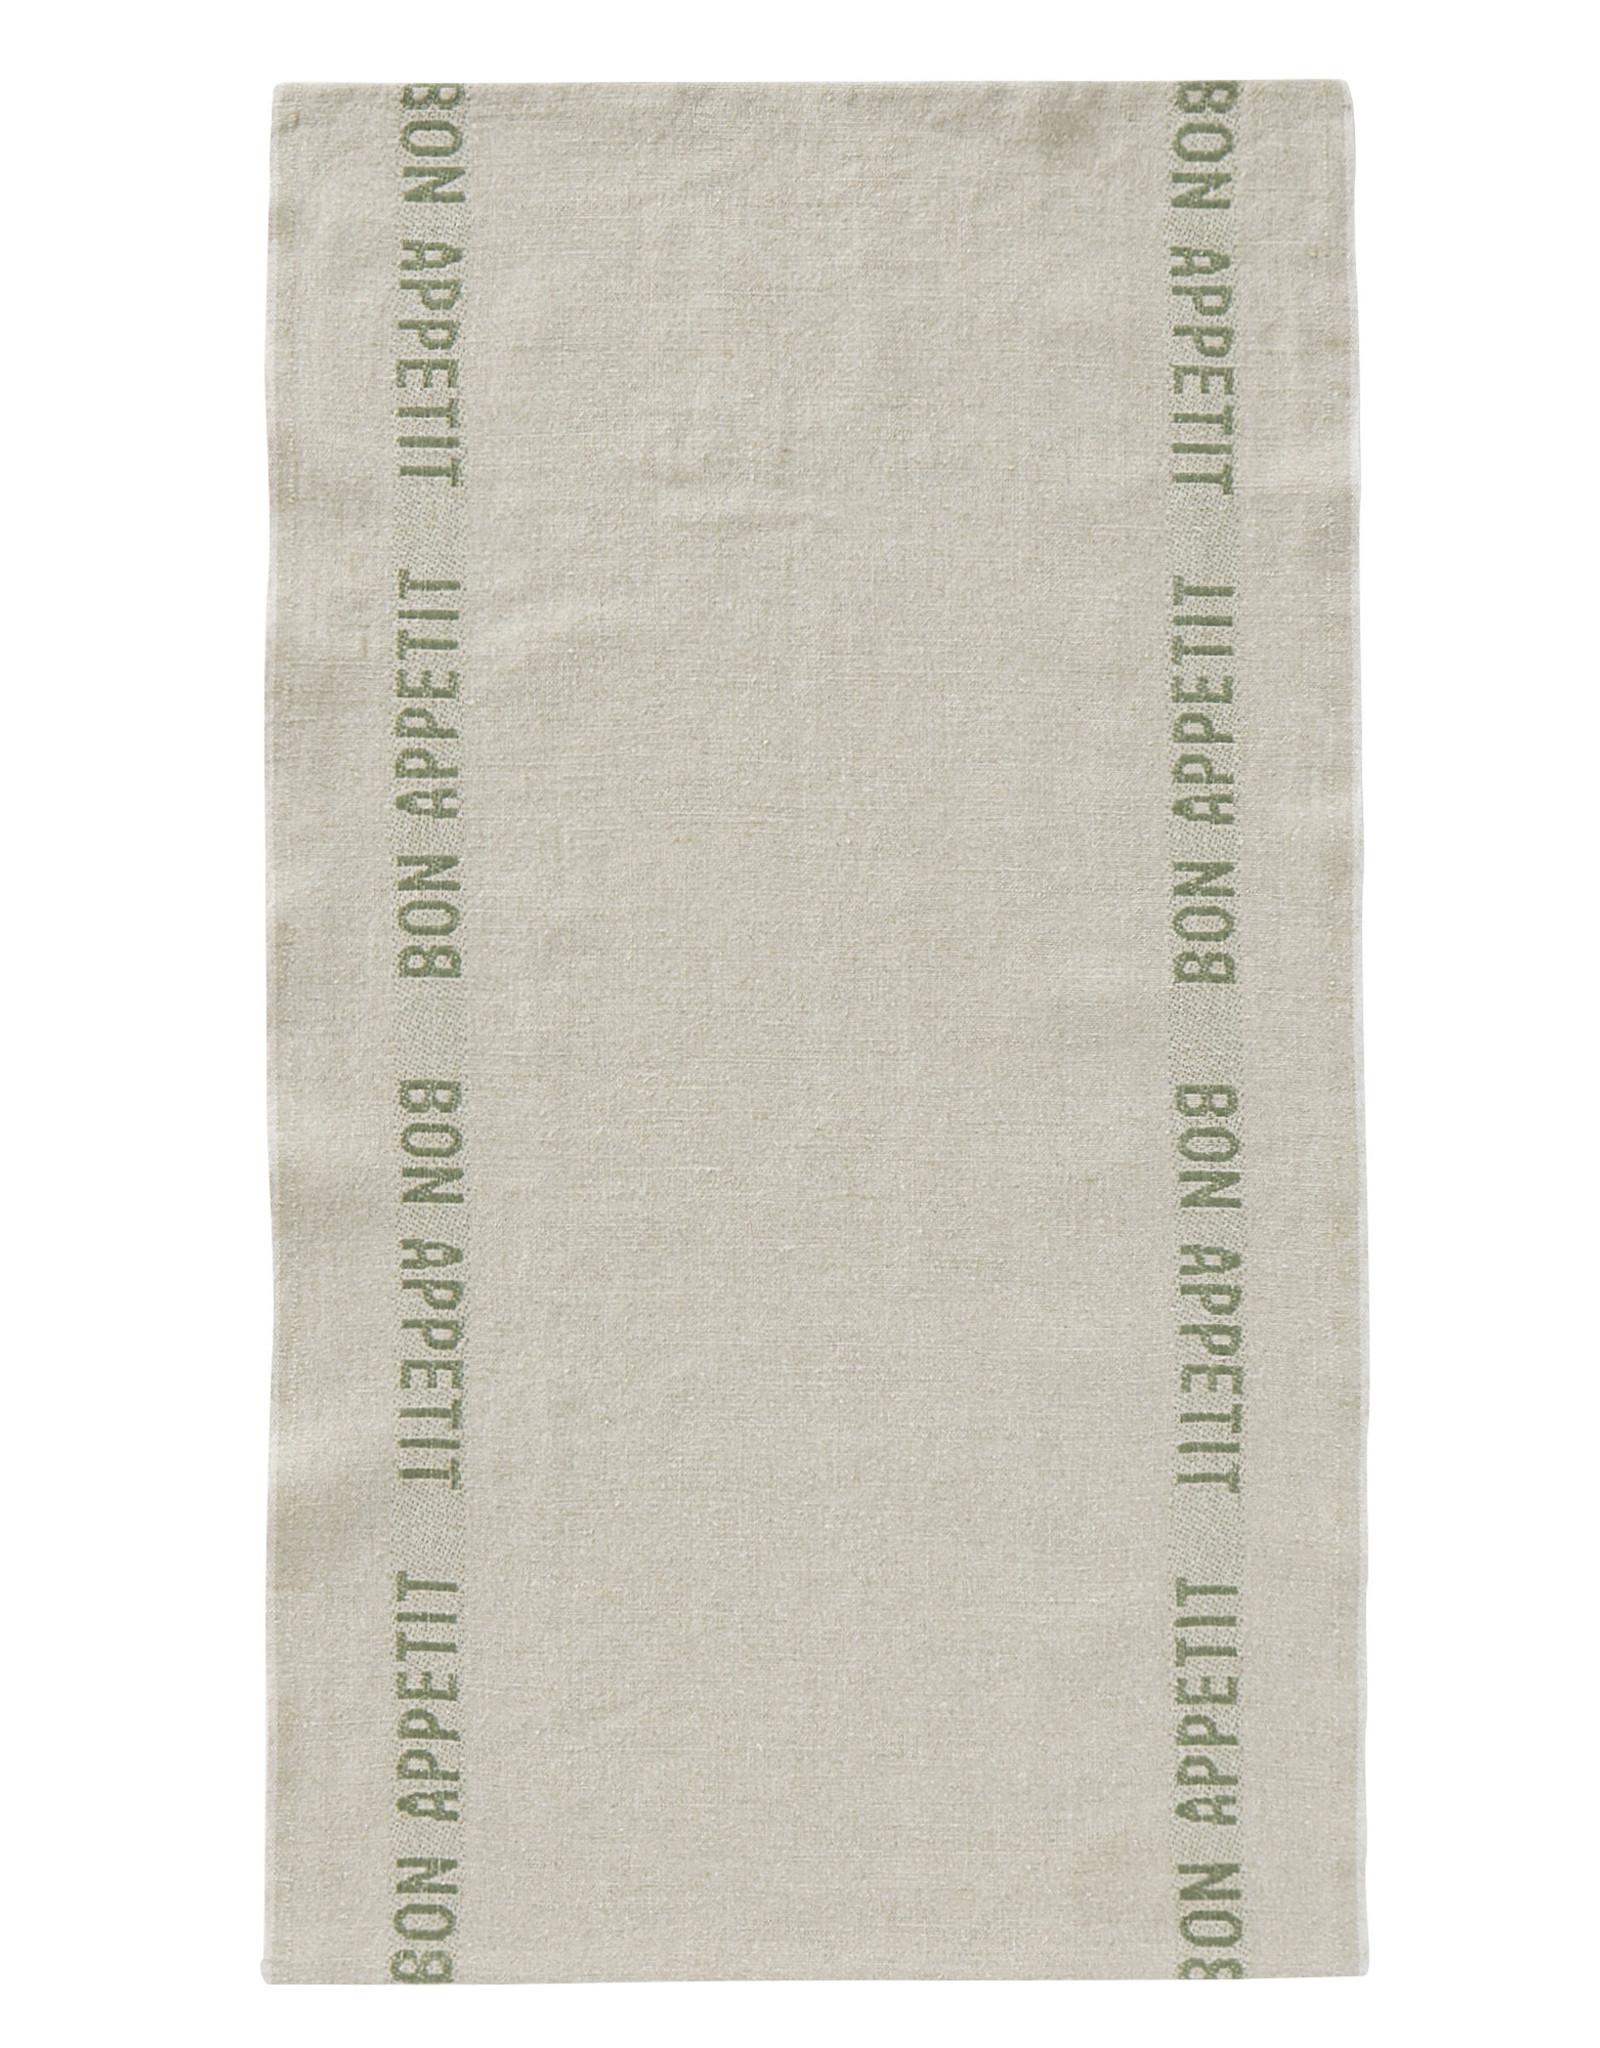 "Charvet Editions - Bon Appetit Tea towel - Natural/Khaki 18"" x 30"""